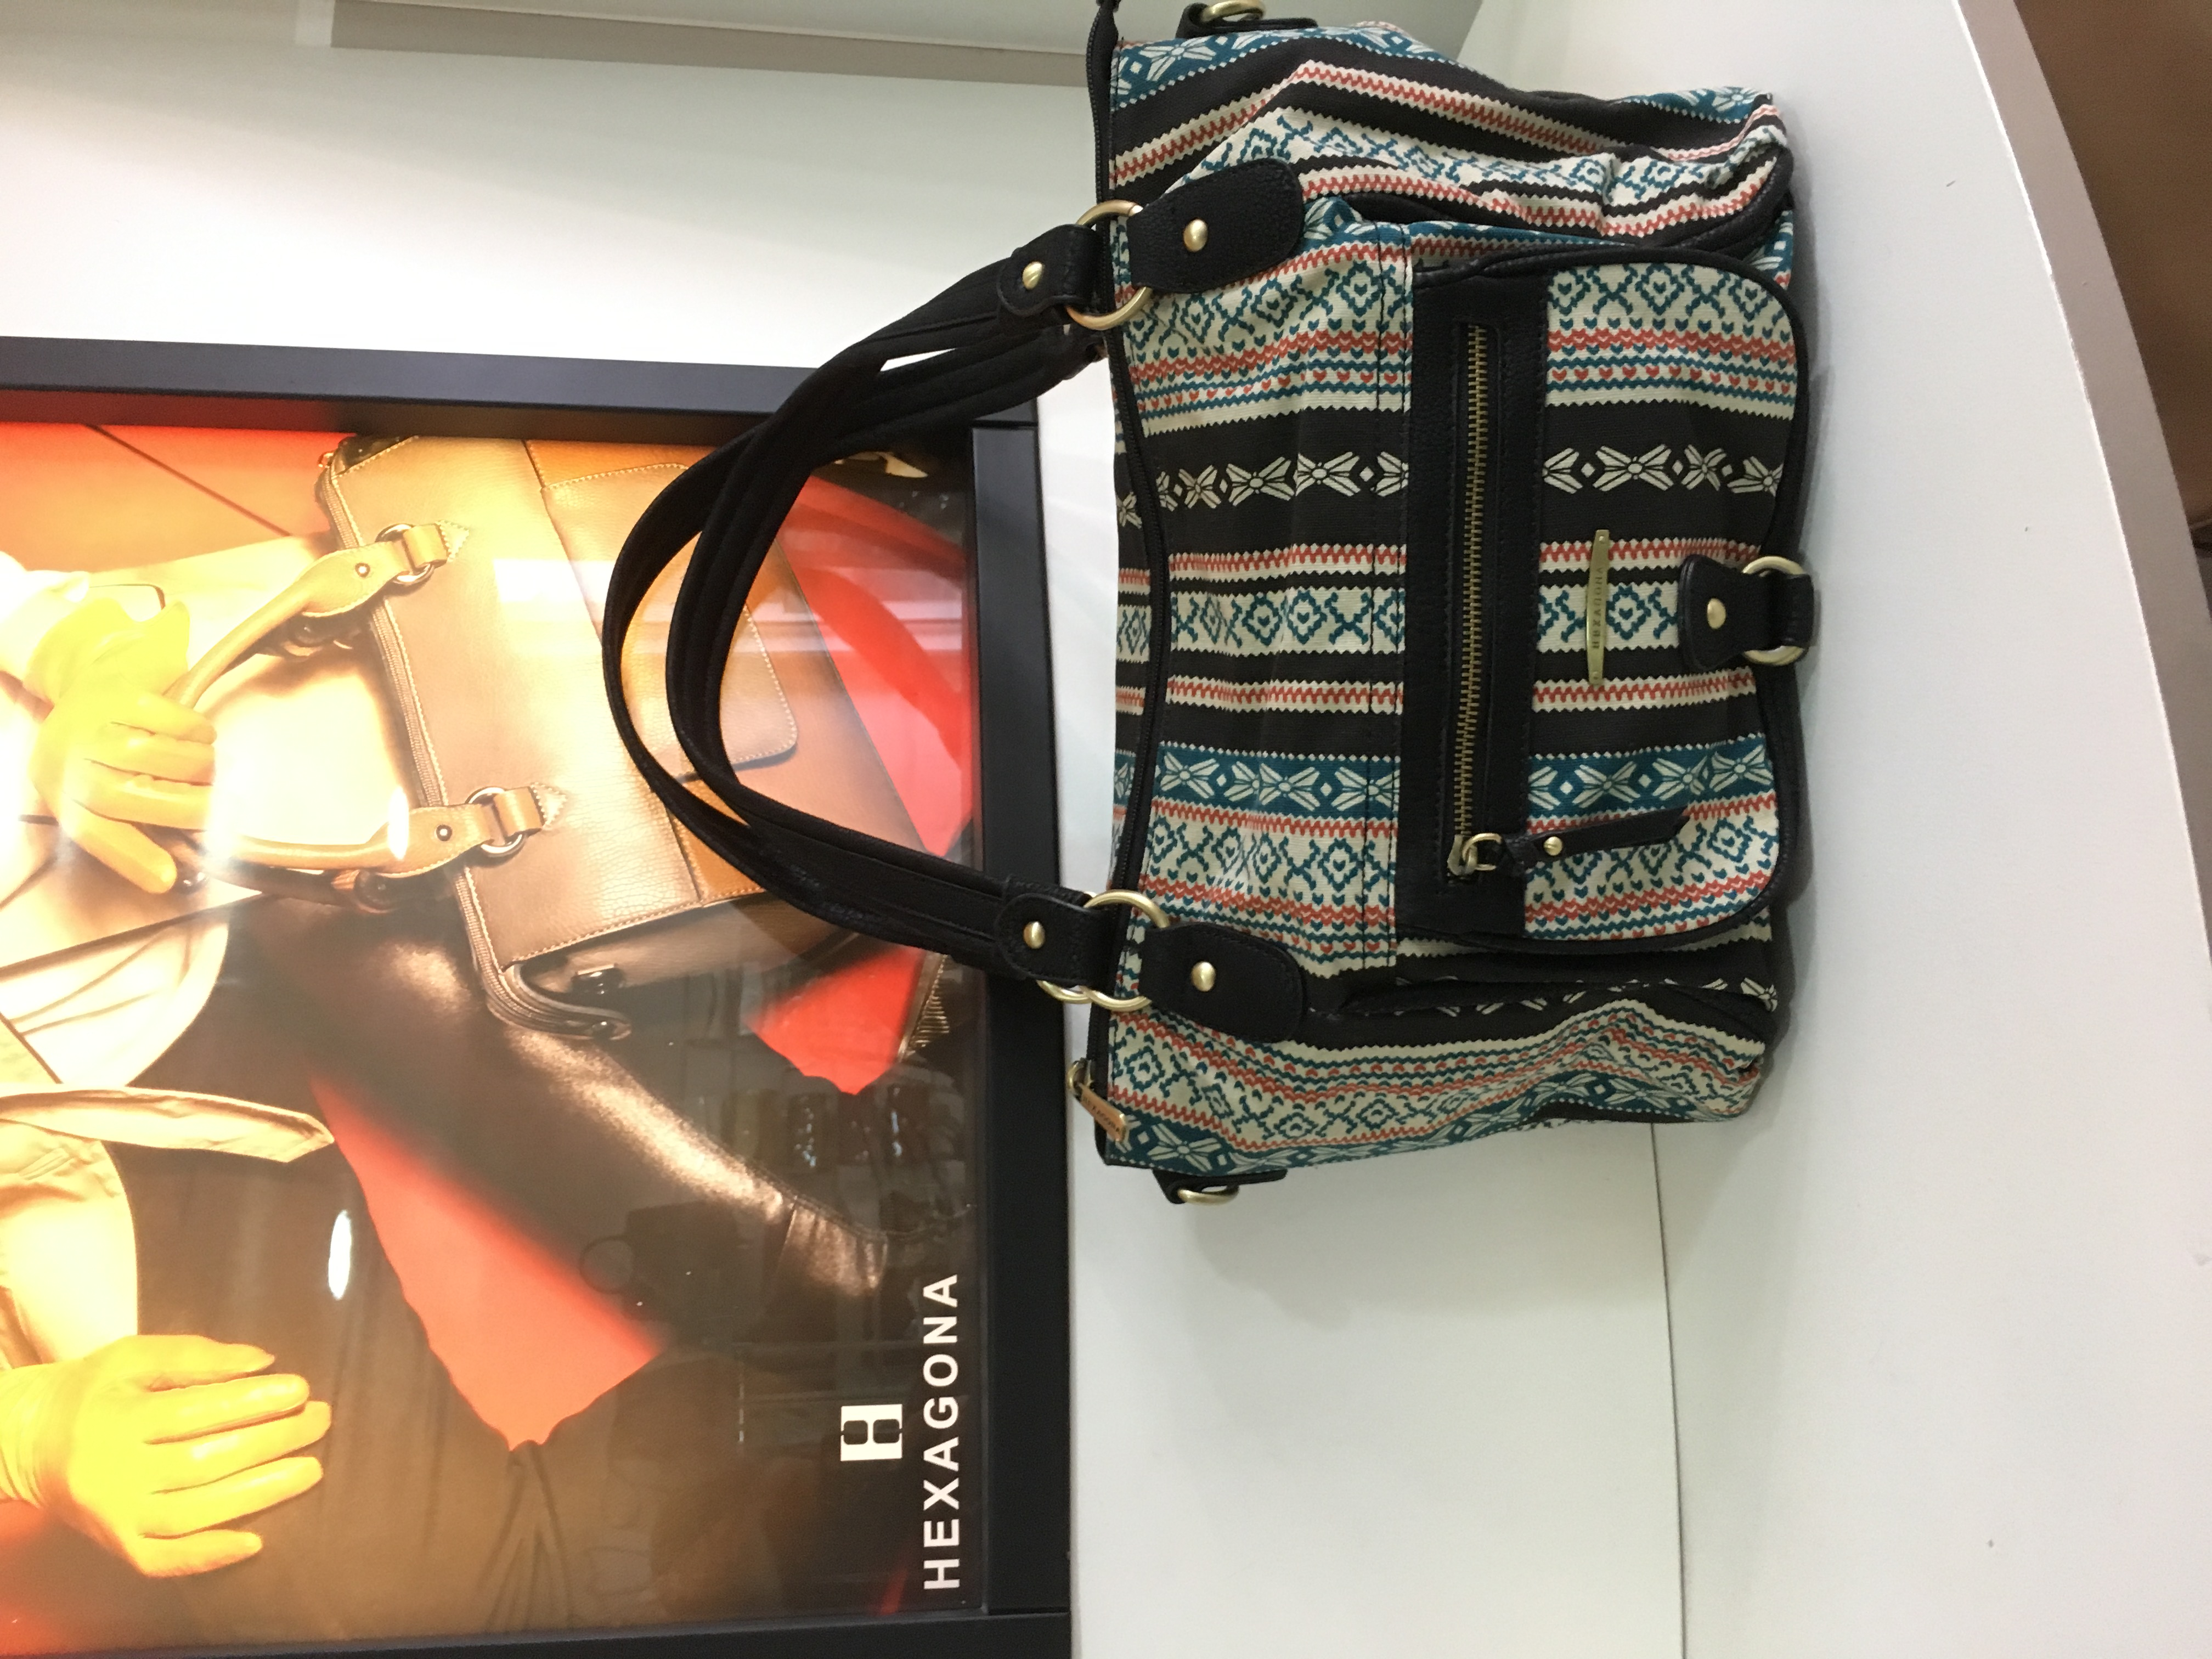 Galerie d'image - ongles d'ivoire